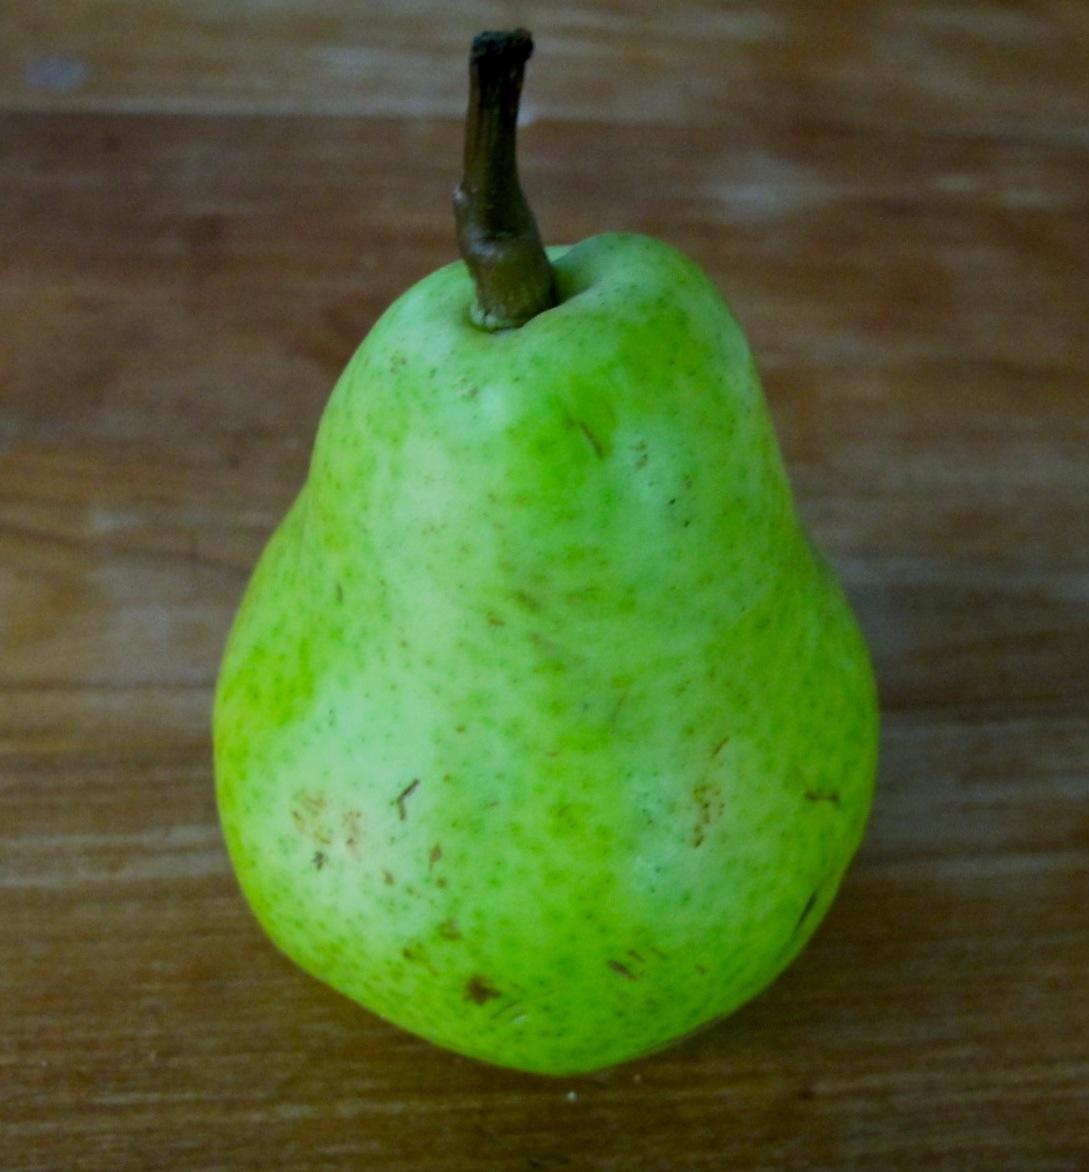 Braised Pears with Brandy Orange Sauce